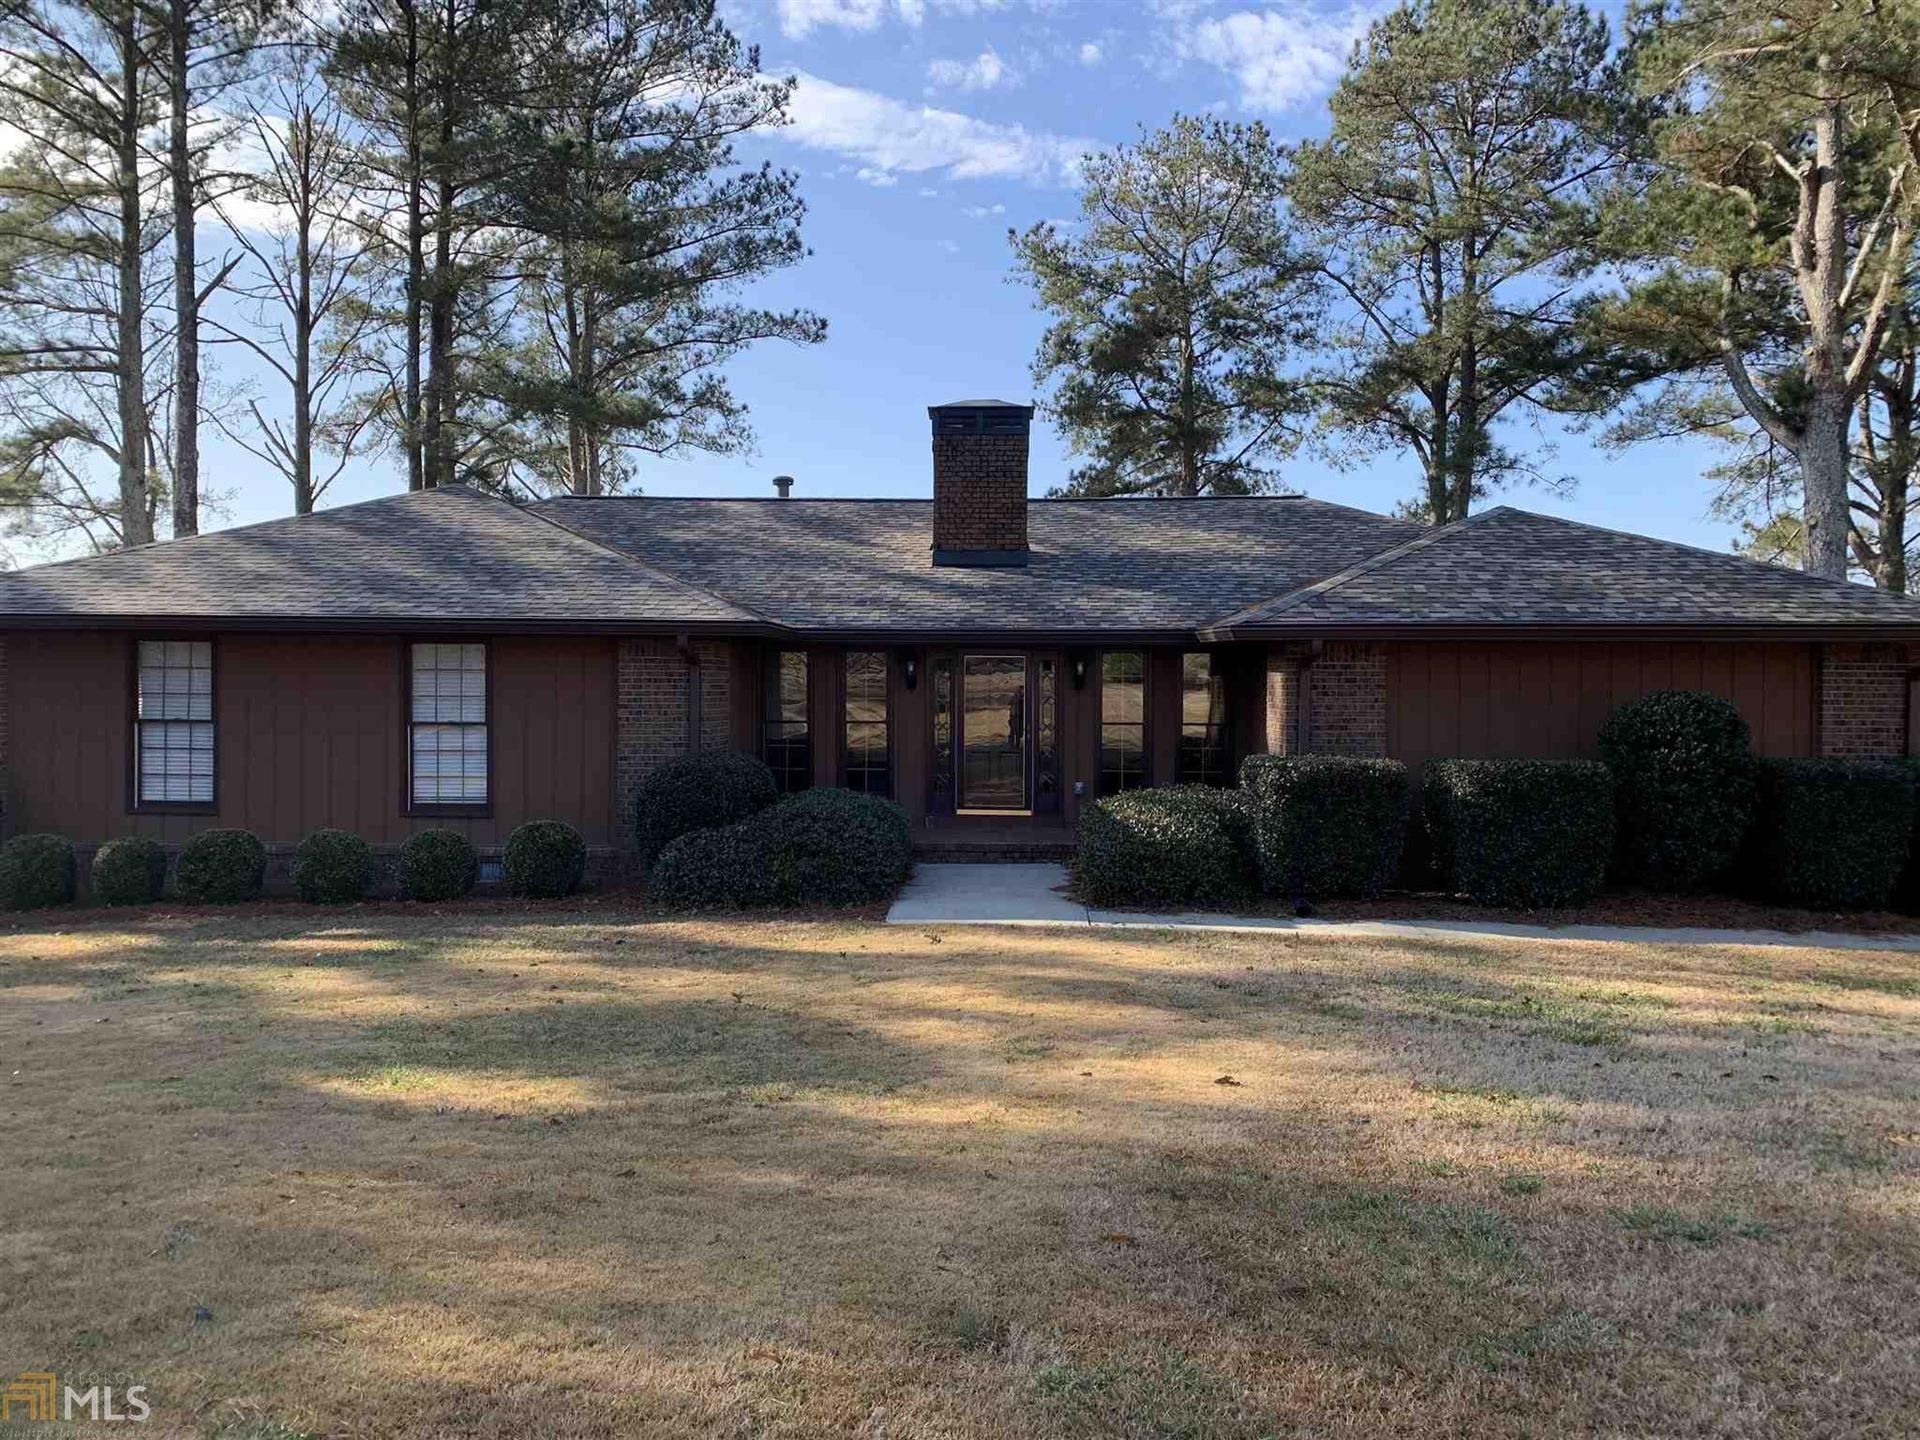 937 Blacklawn Rd, Conyers, GA 30094 - MLS#: 8912026